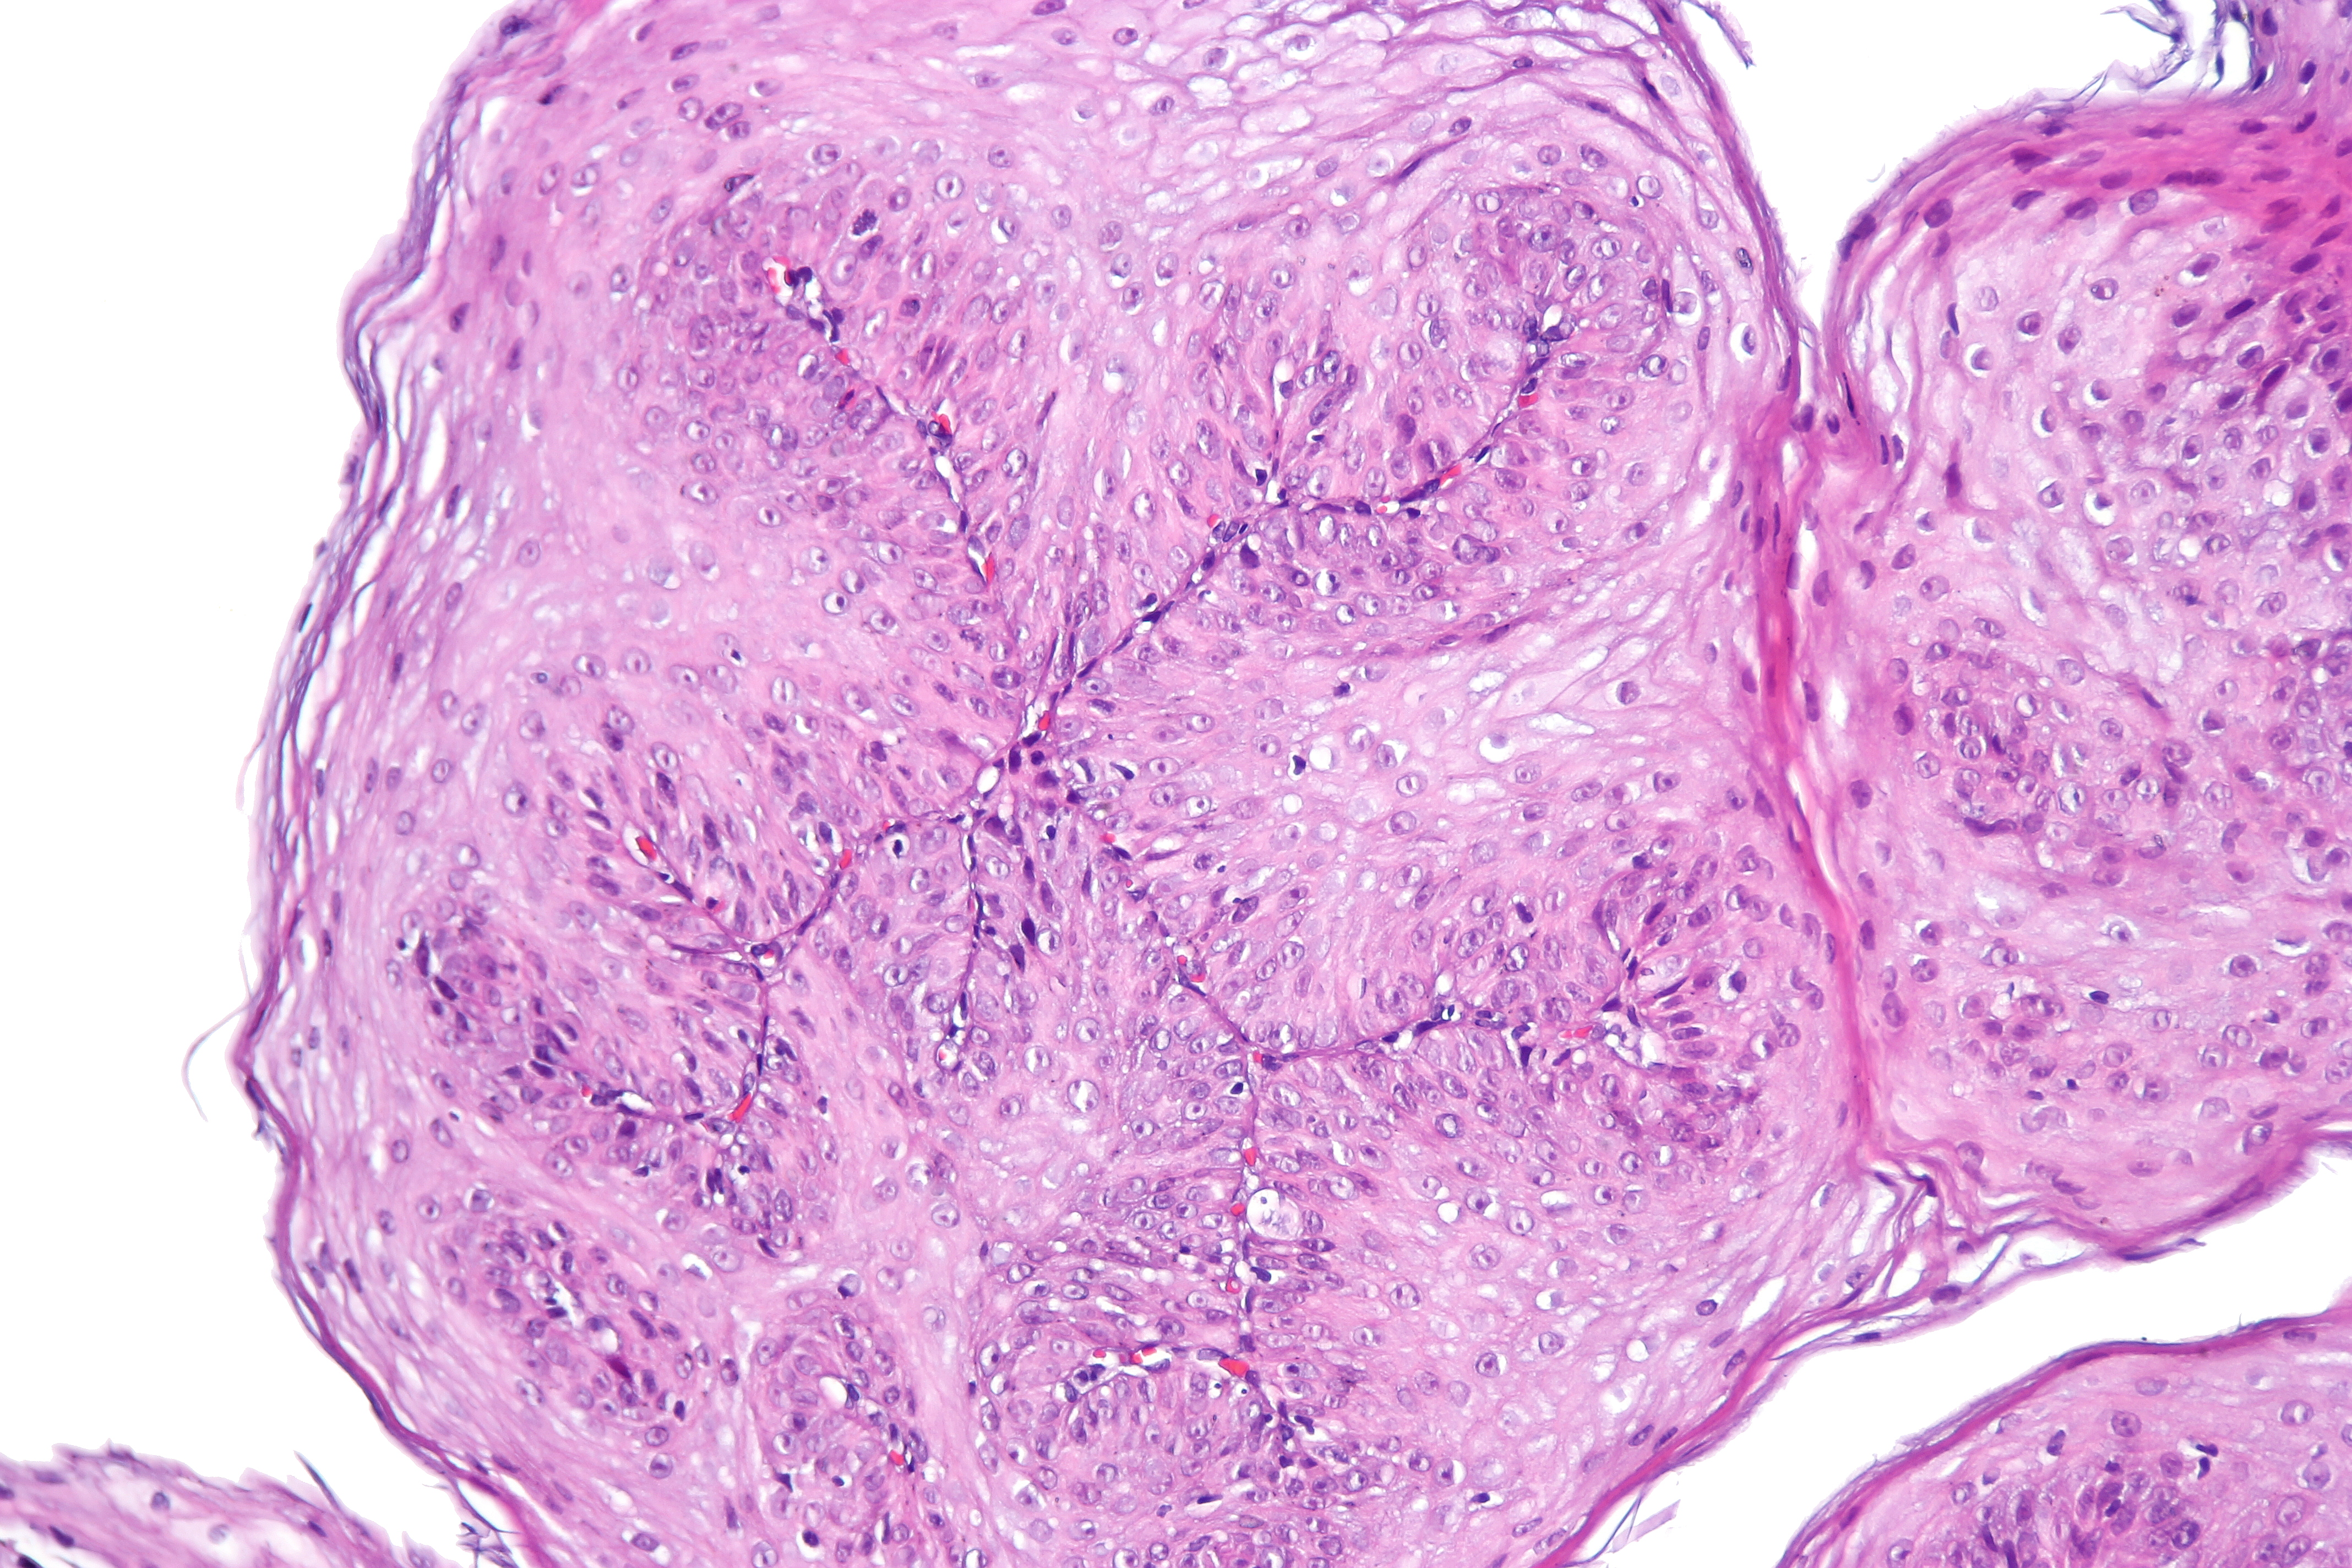 Cancerul esofagian, locul sase in lume in topul mortalitatii prin cancer